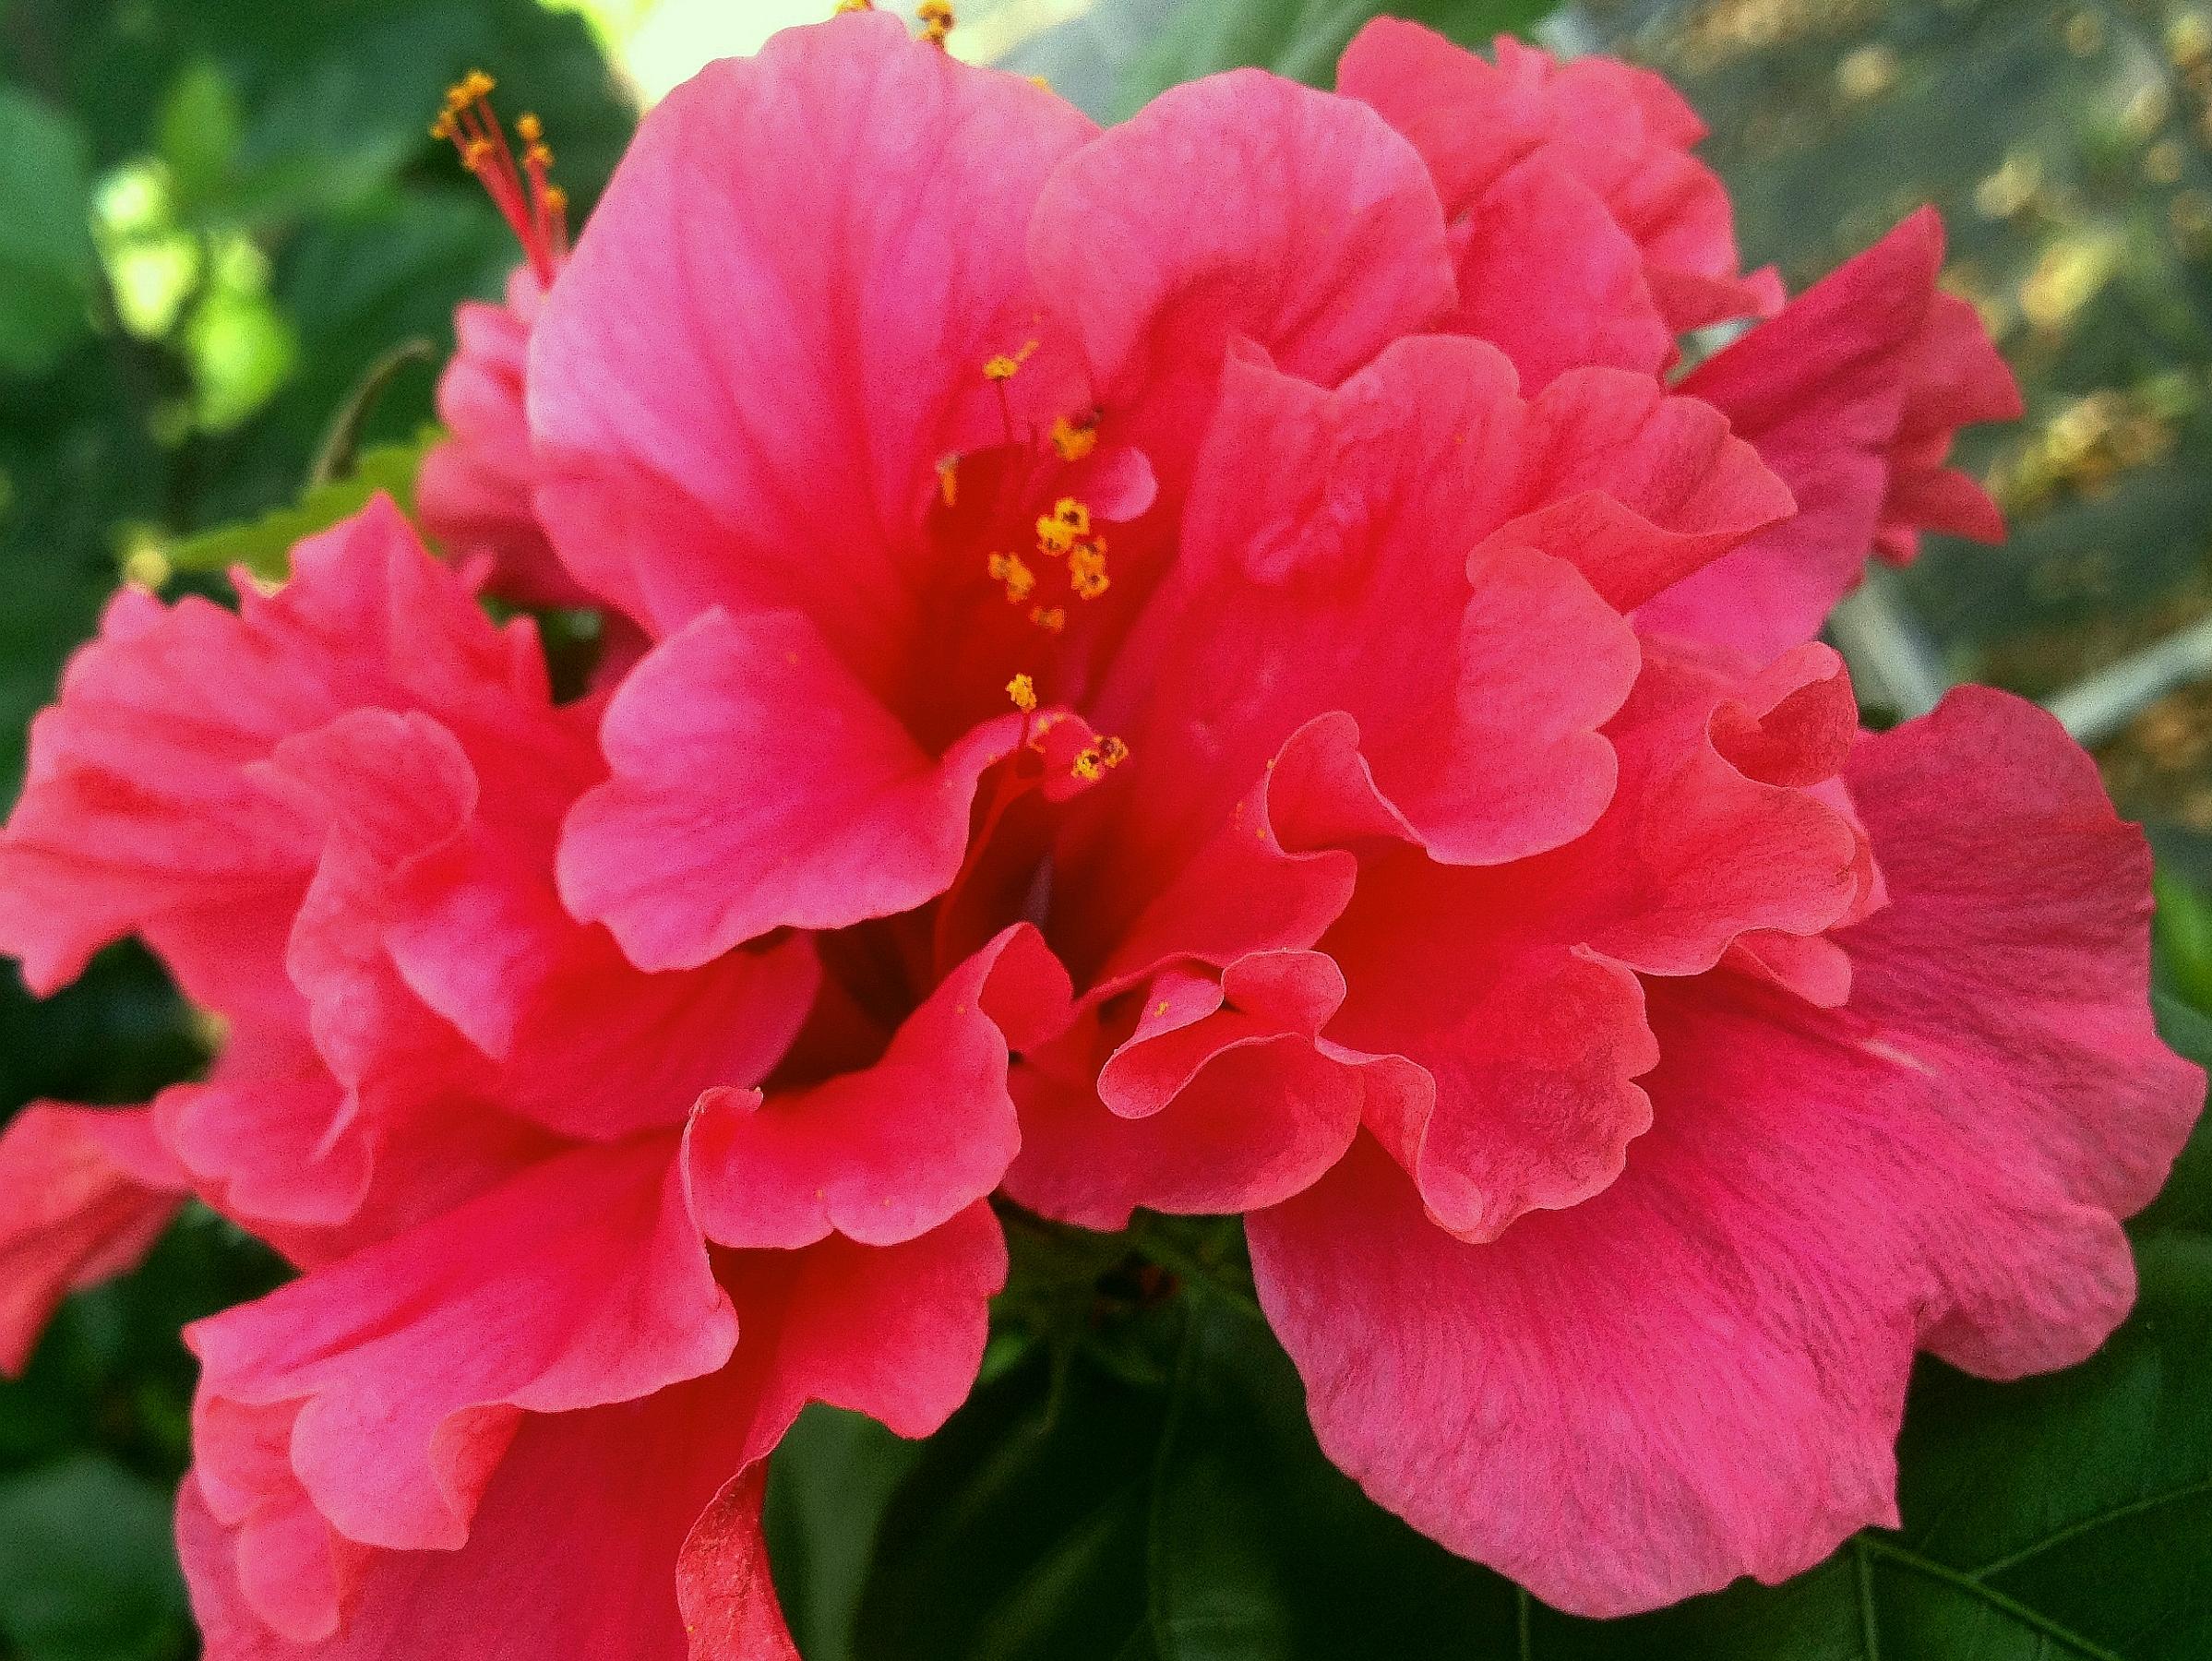 Pride of hankins bush tropical hibiscus plant triple hot fuchsia pride of hankins bush tropical hibiscus plant triple hot fuchsia salmon pink flower emerald goddess gardens larger image mightylinksfo